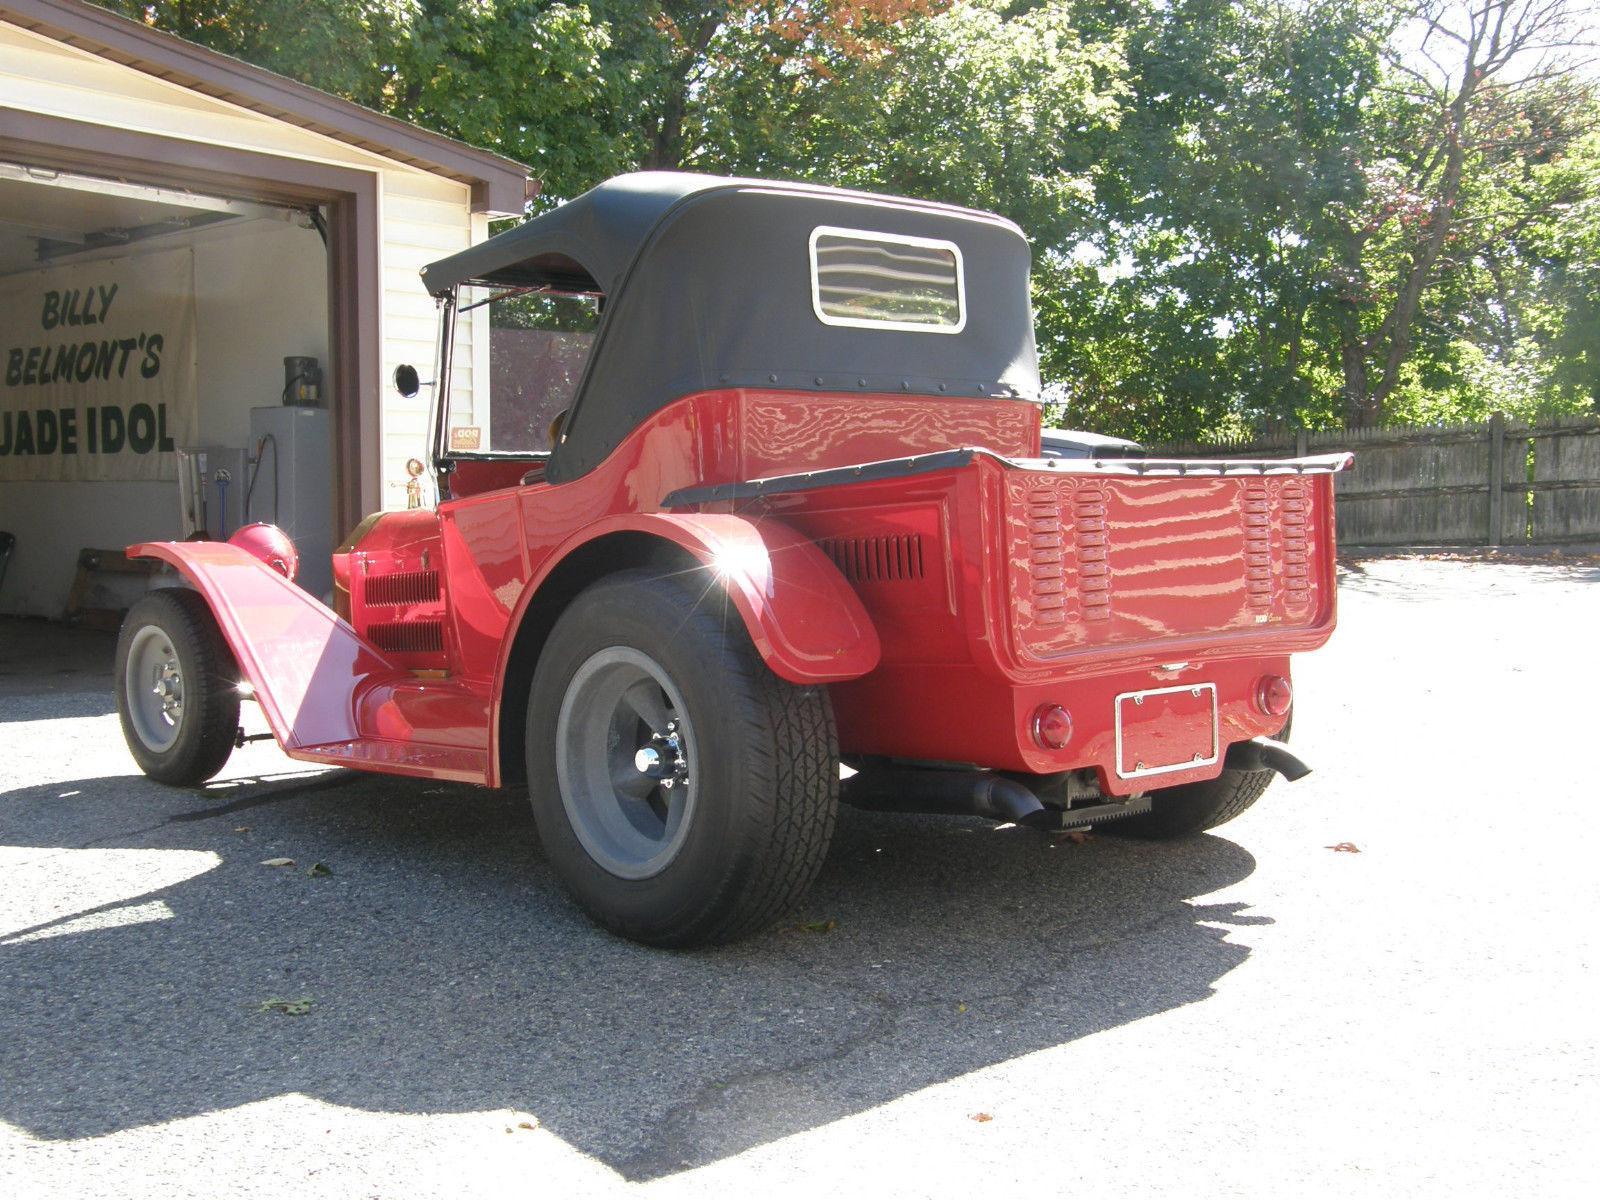 Cool Model T Project For Sale Gallery - Classic Cars Ideas - boiq.info